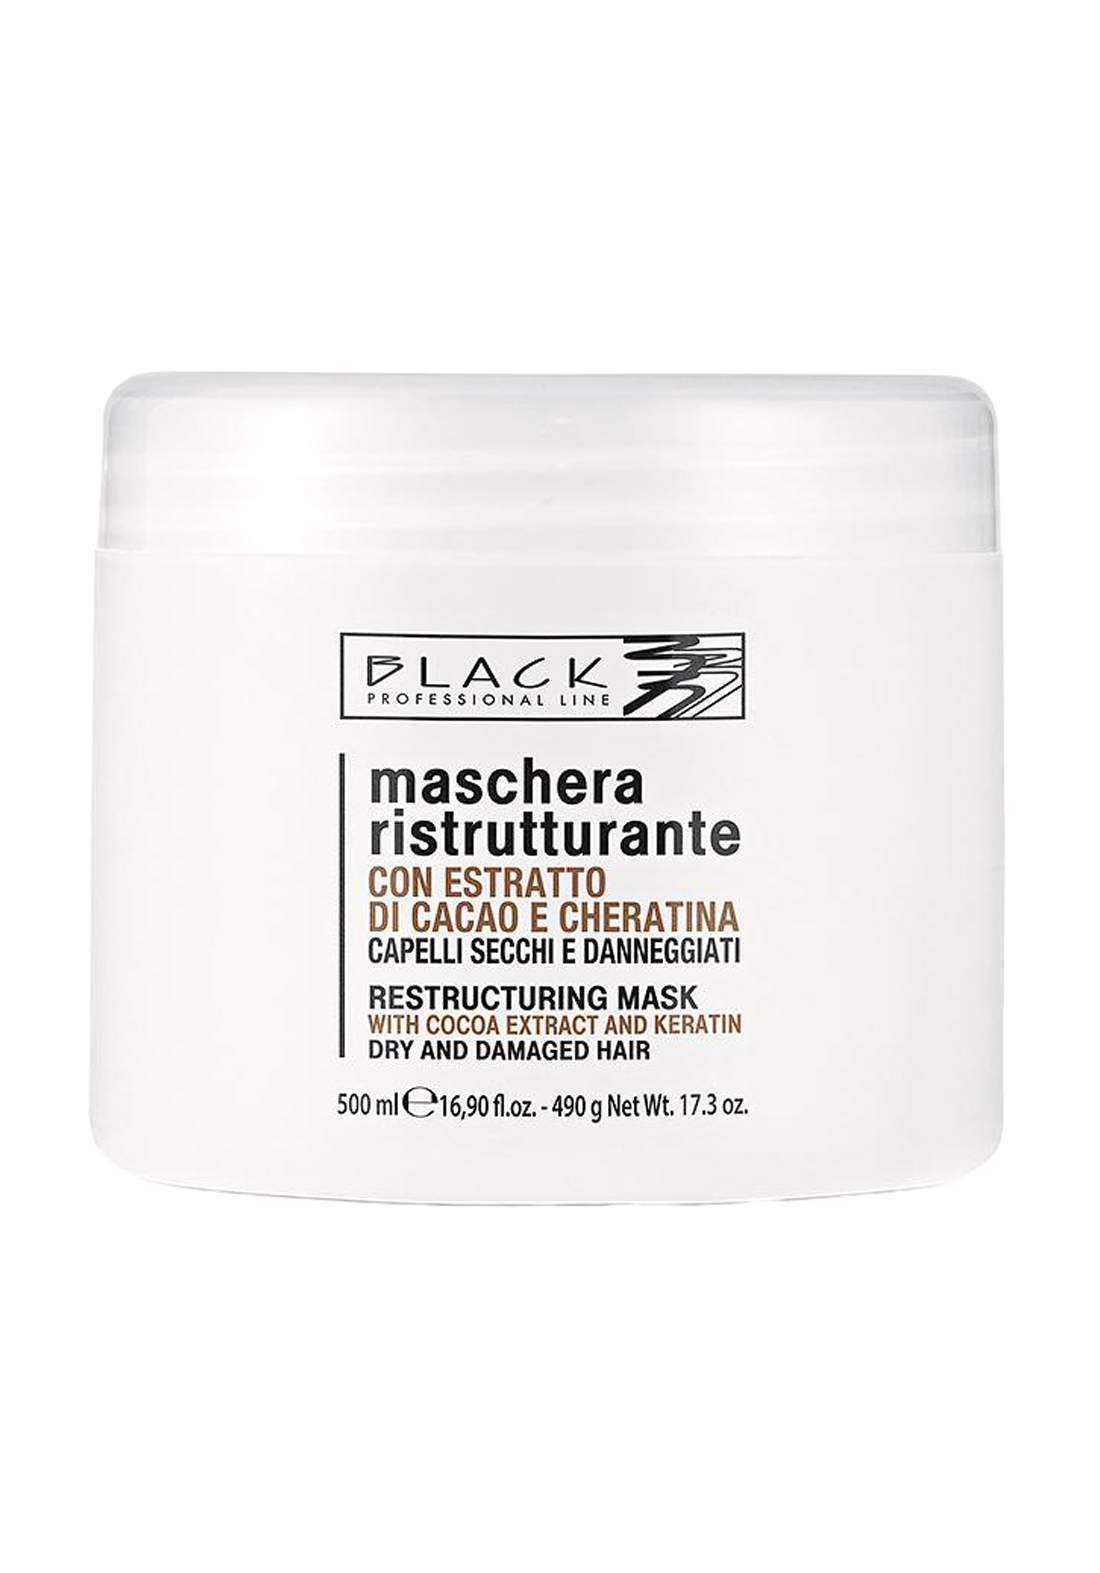 Black Professional Hair Mask With Cocoa And Keratin 500ml معالج للشعر